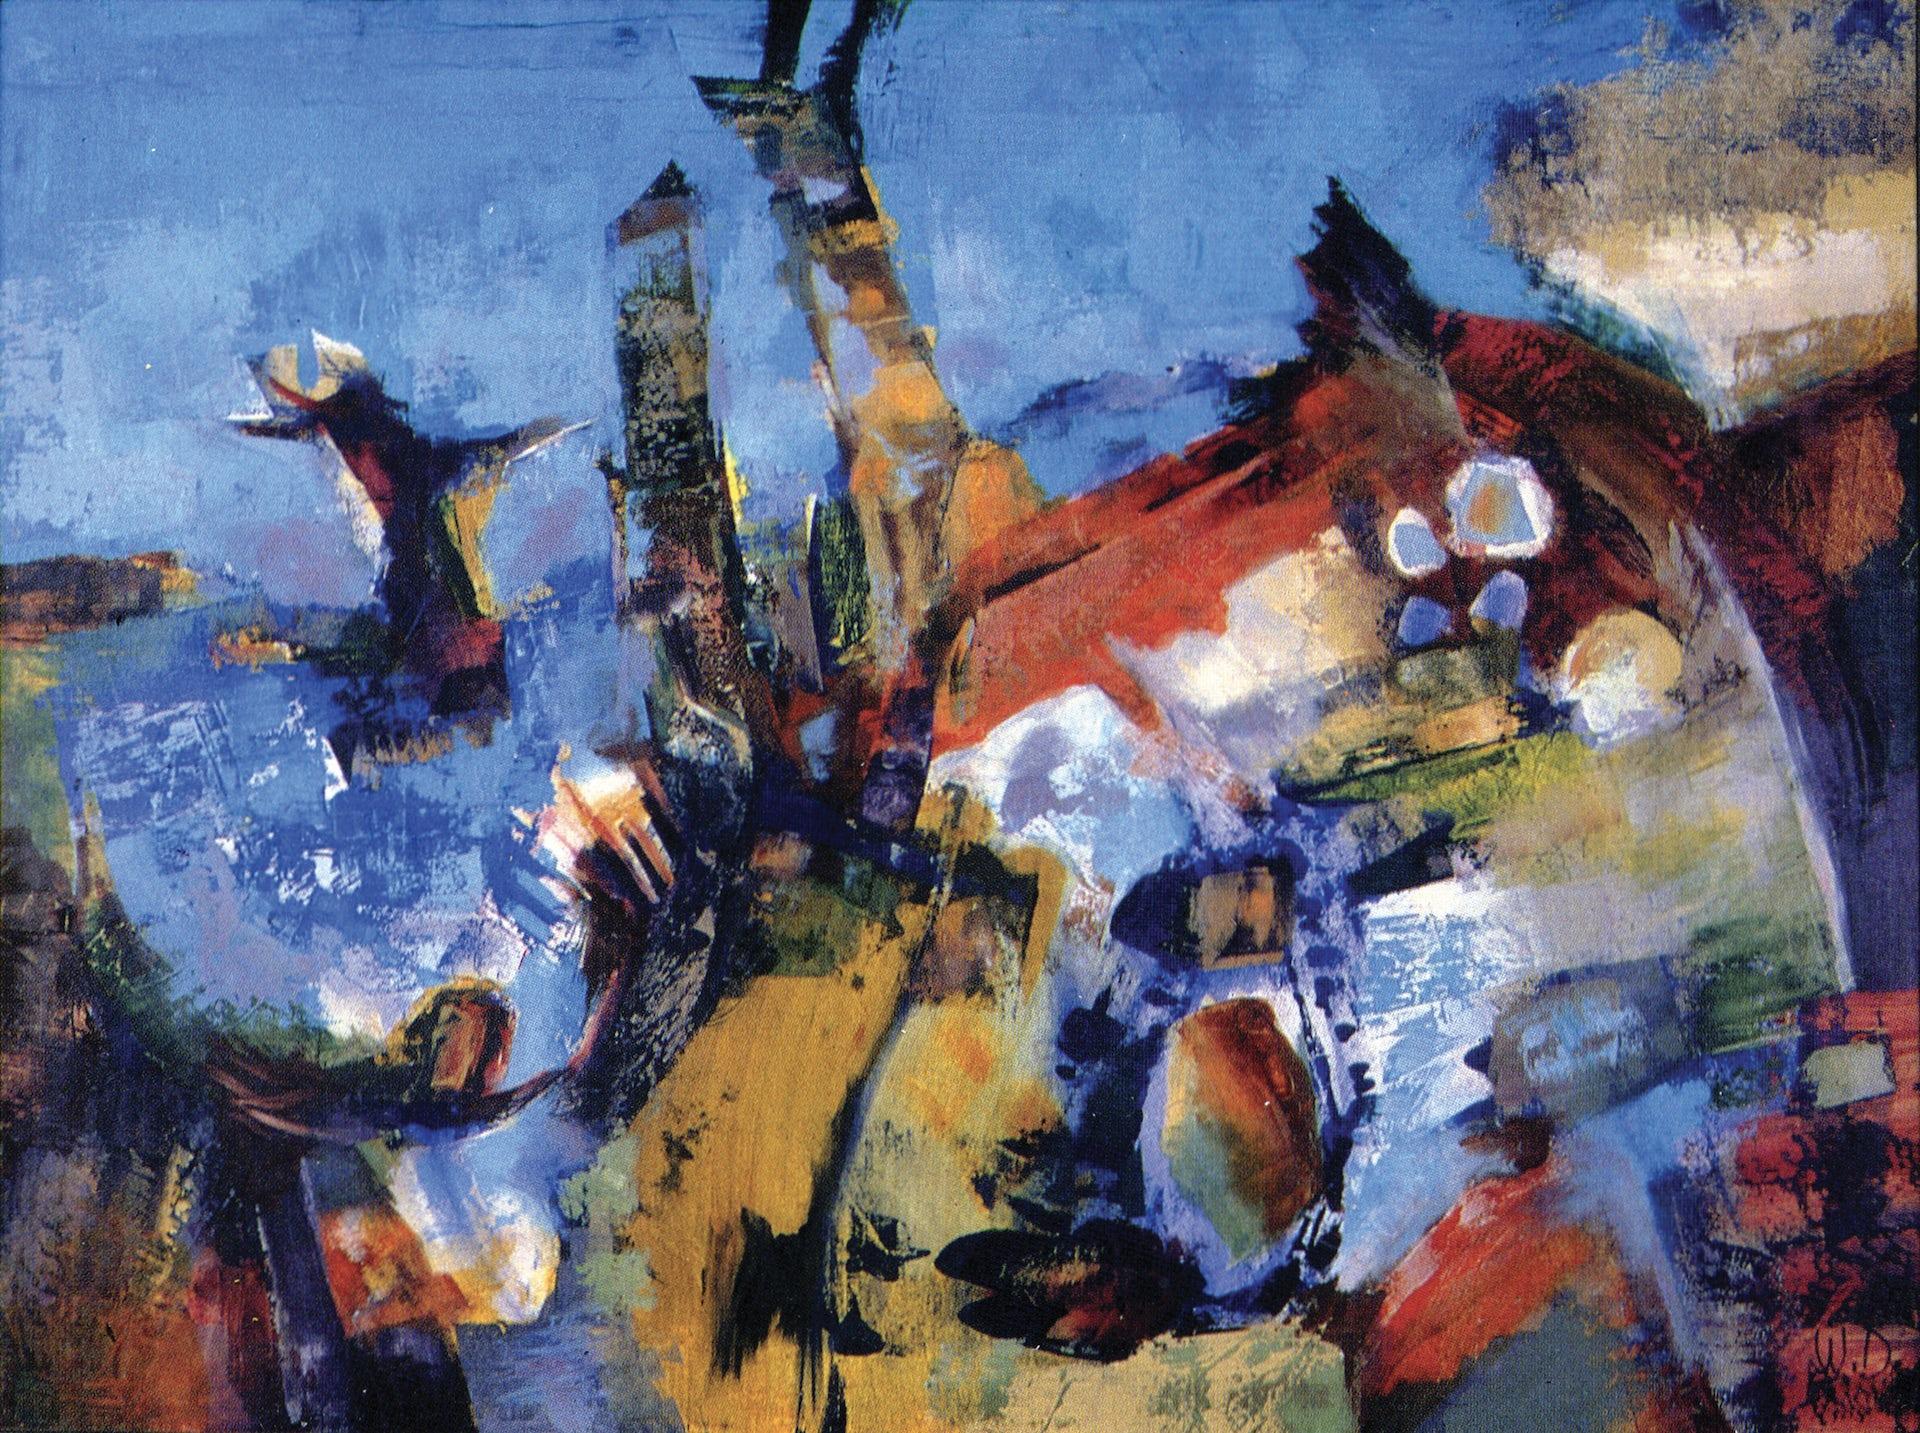 Polish Resistance fighter, 'Slavic space age' modernist, legendary Australian artist